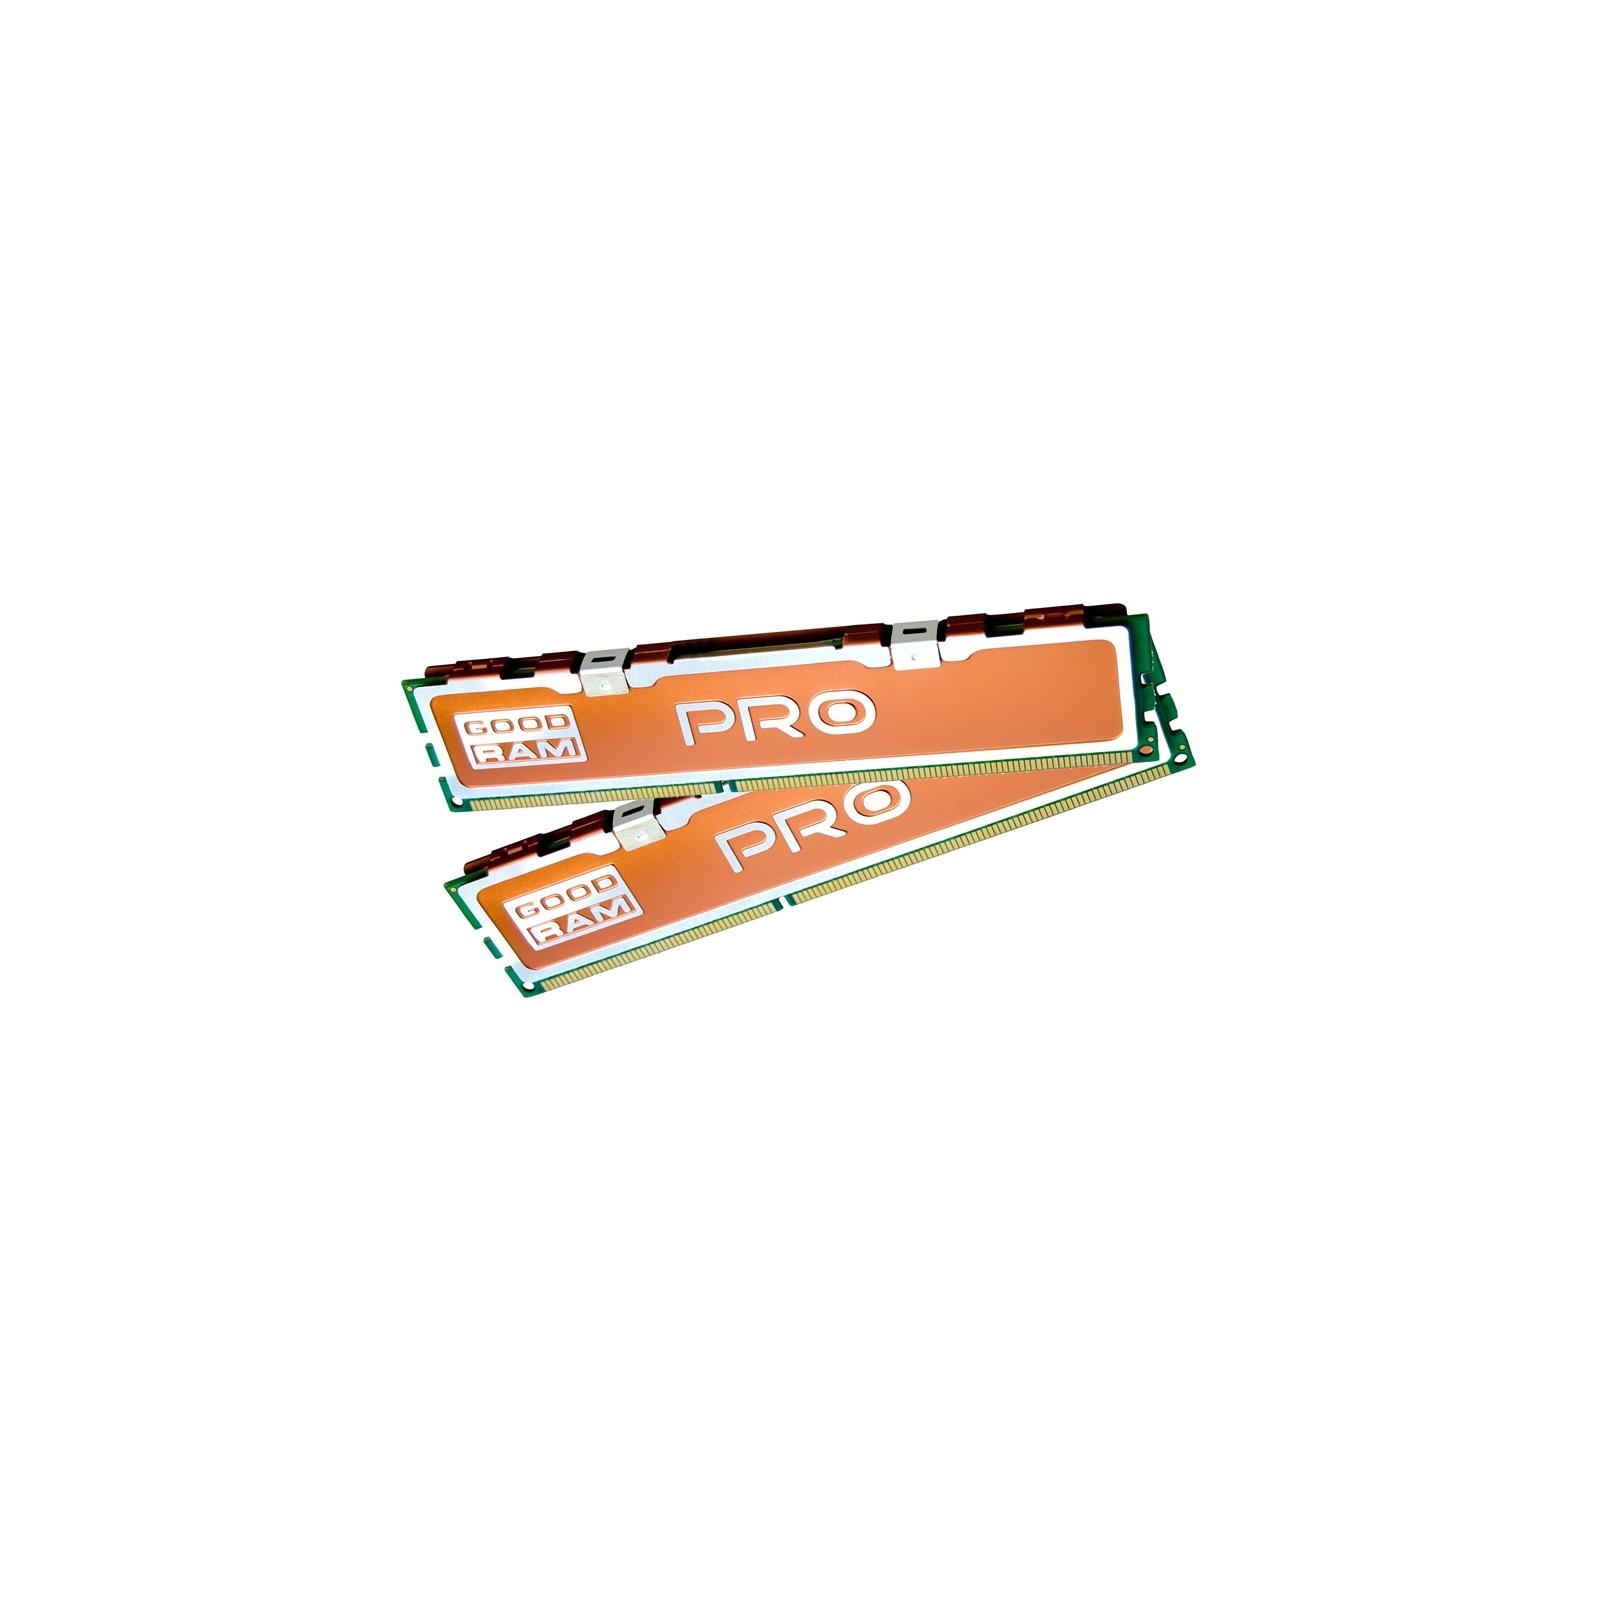 Модуль памяти для компьютера DDR3 8Gb (2x4GB) 2400 MHz PRO GOODRAM (GP2400D364L11S/8GDC) изображение 3